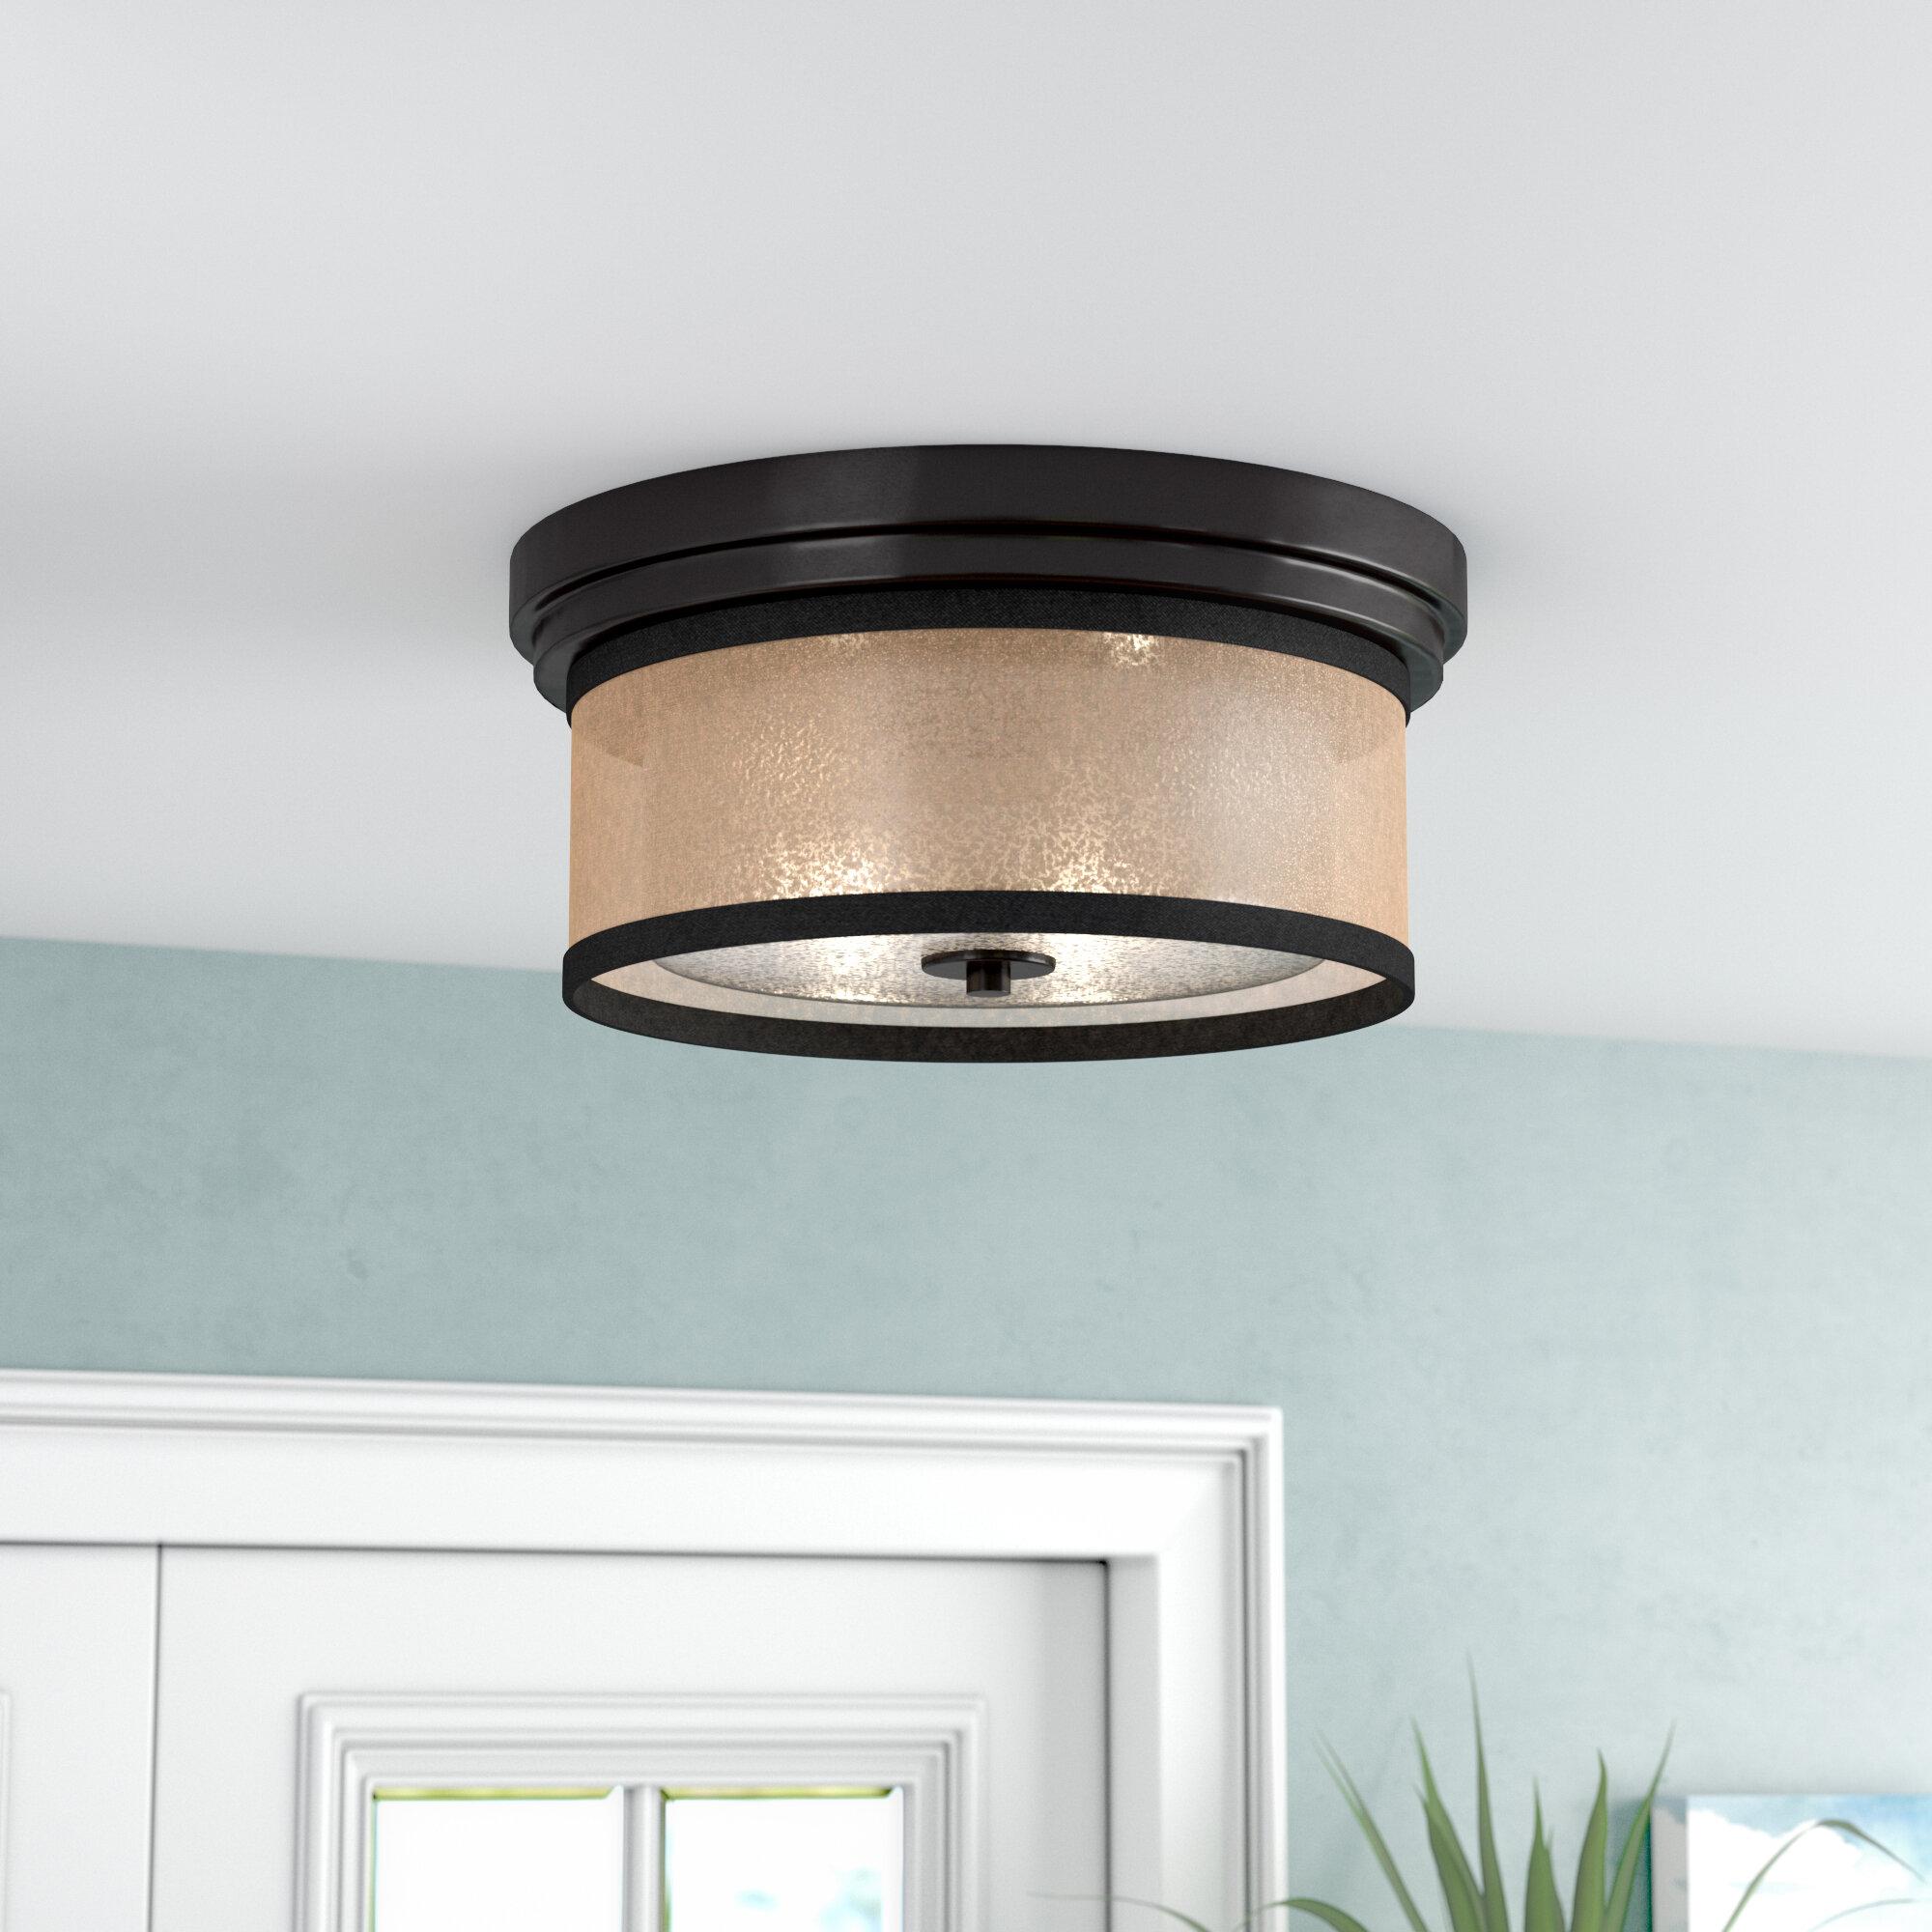 Beachcrest Home Shalisa 2-Light Flush Mount & Reviews | Wayfair